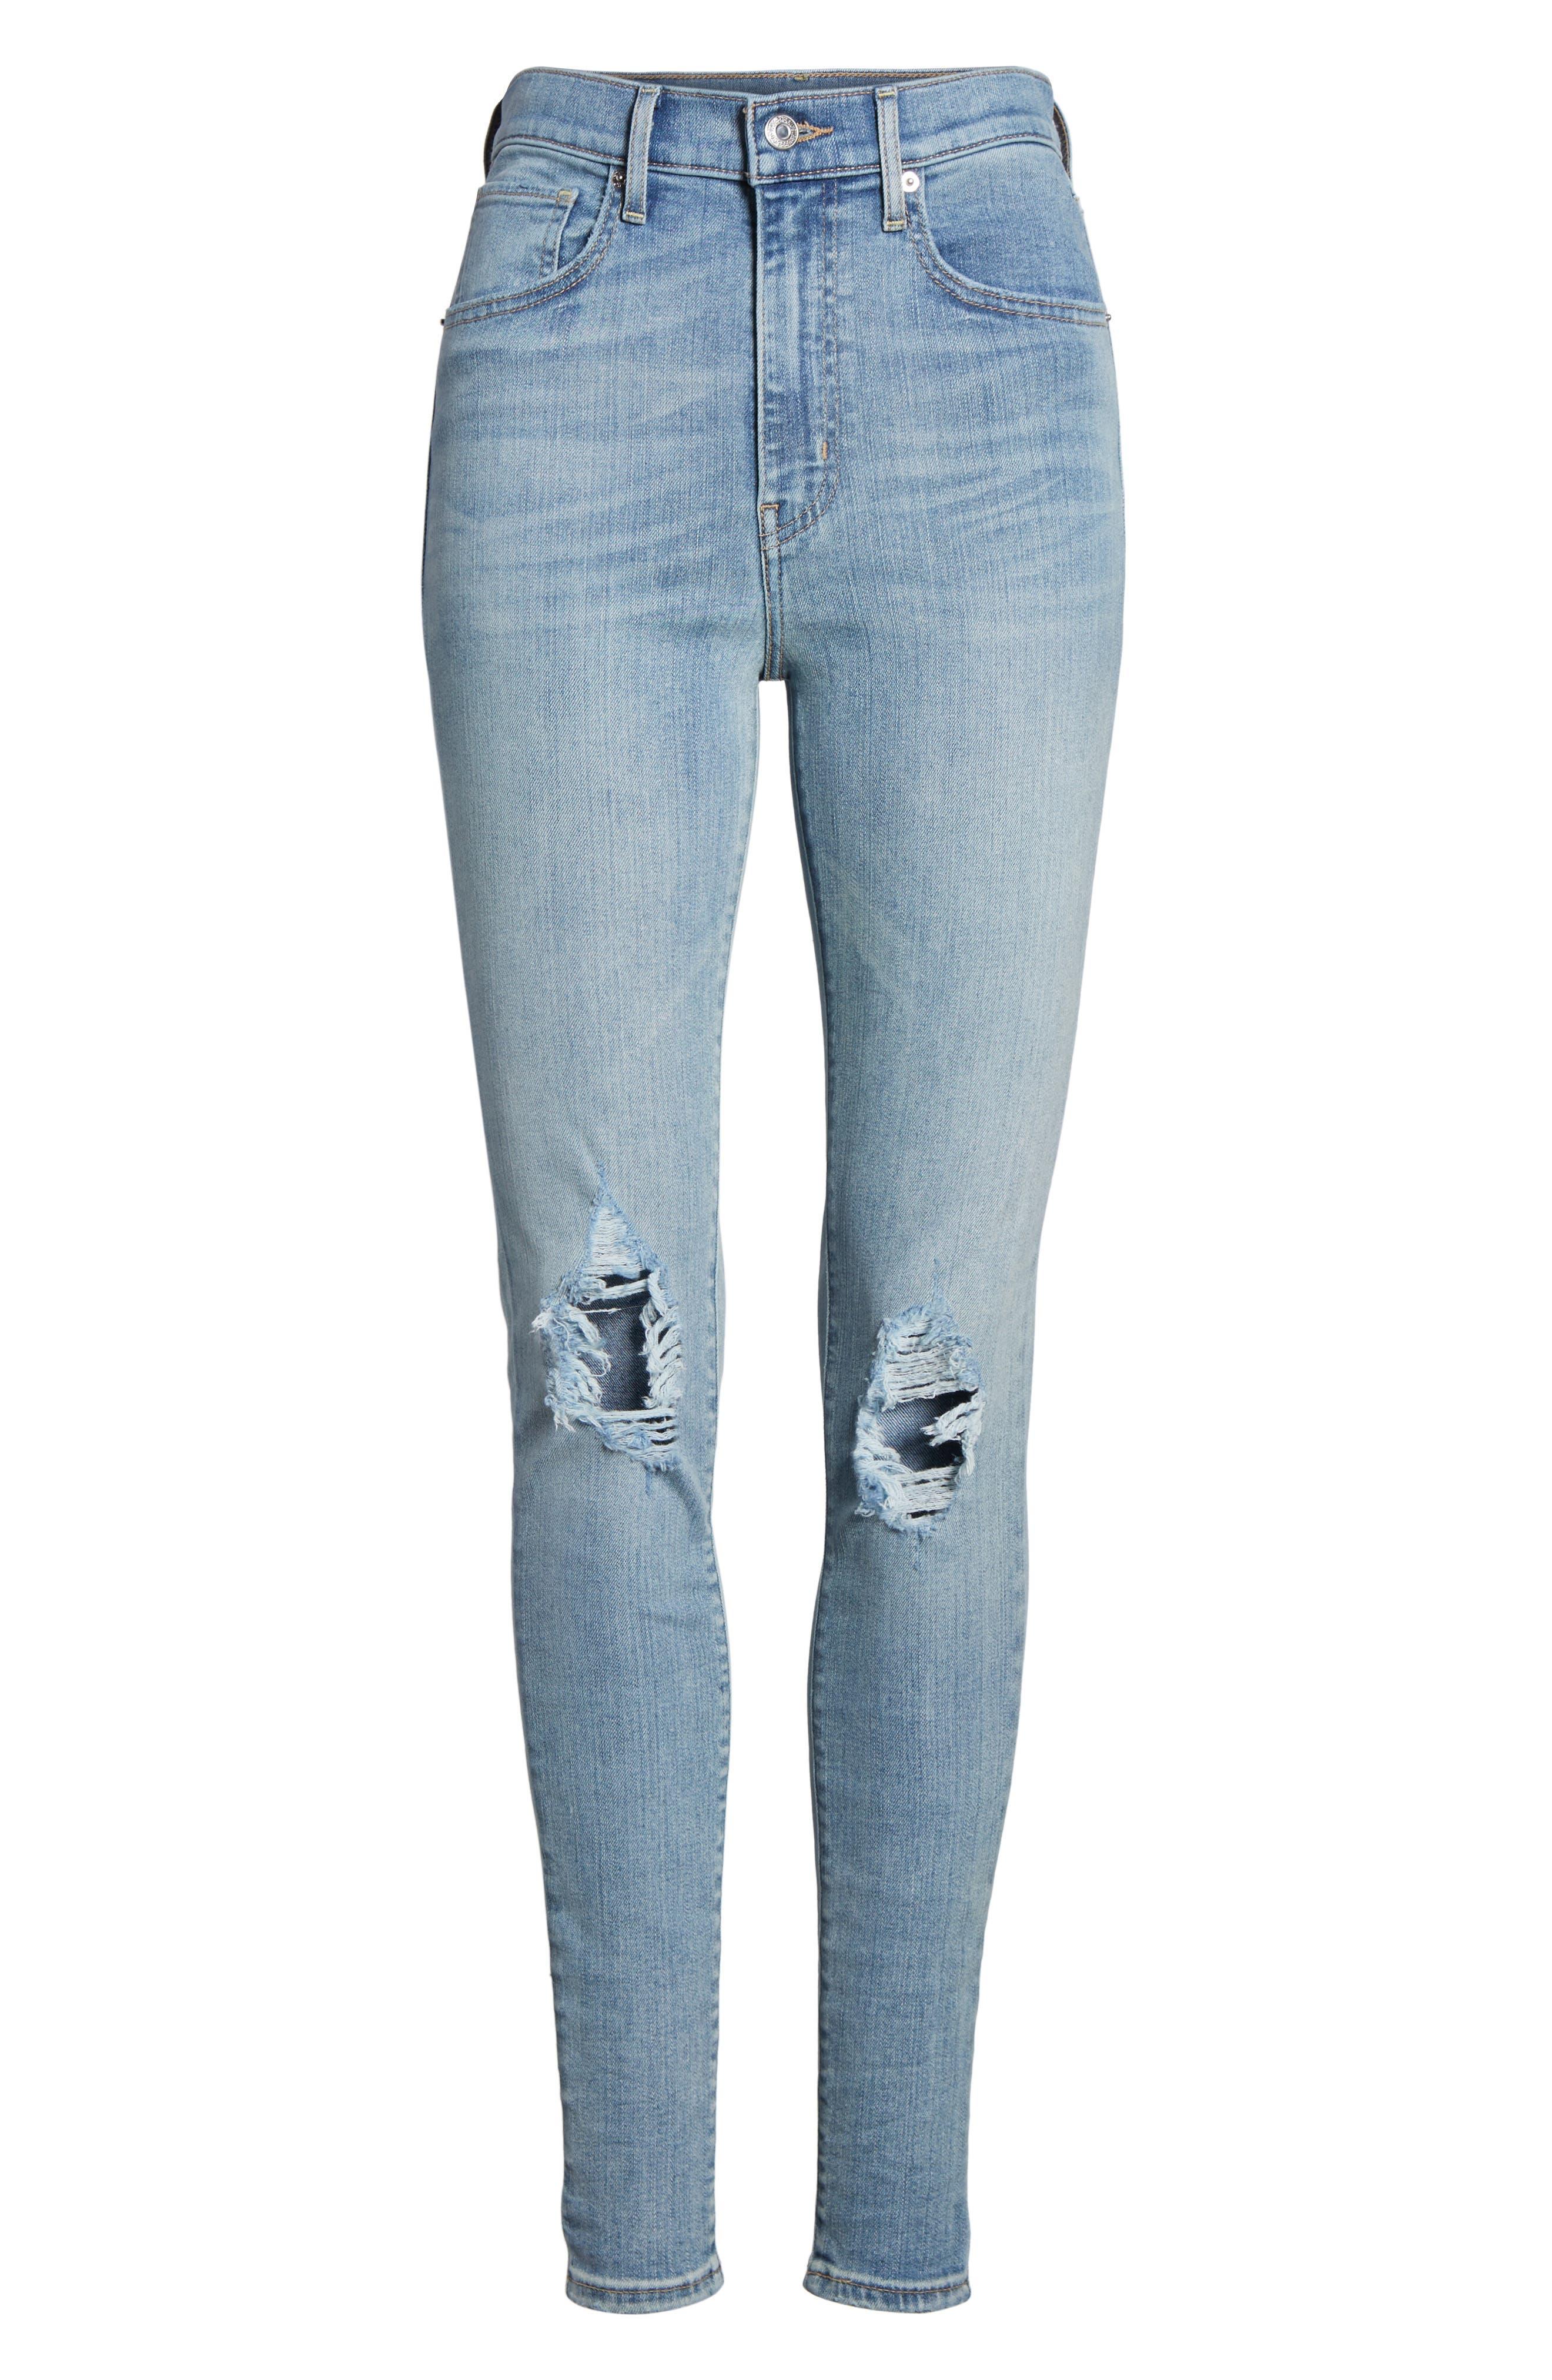 Mile High Super Skinny Jeans,                             Alternate thumbnail 7, color,                             450